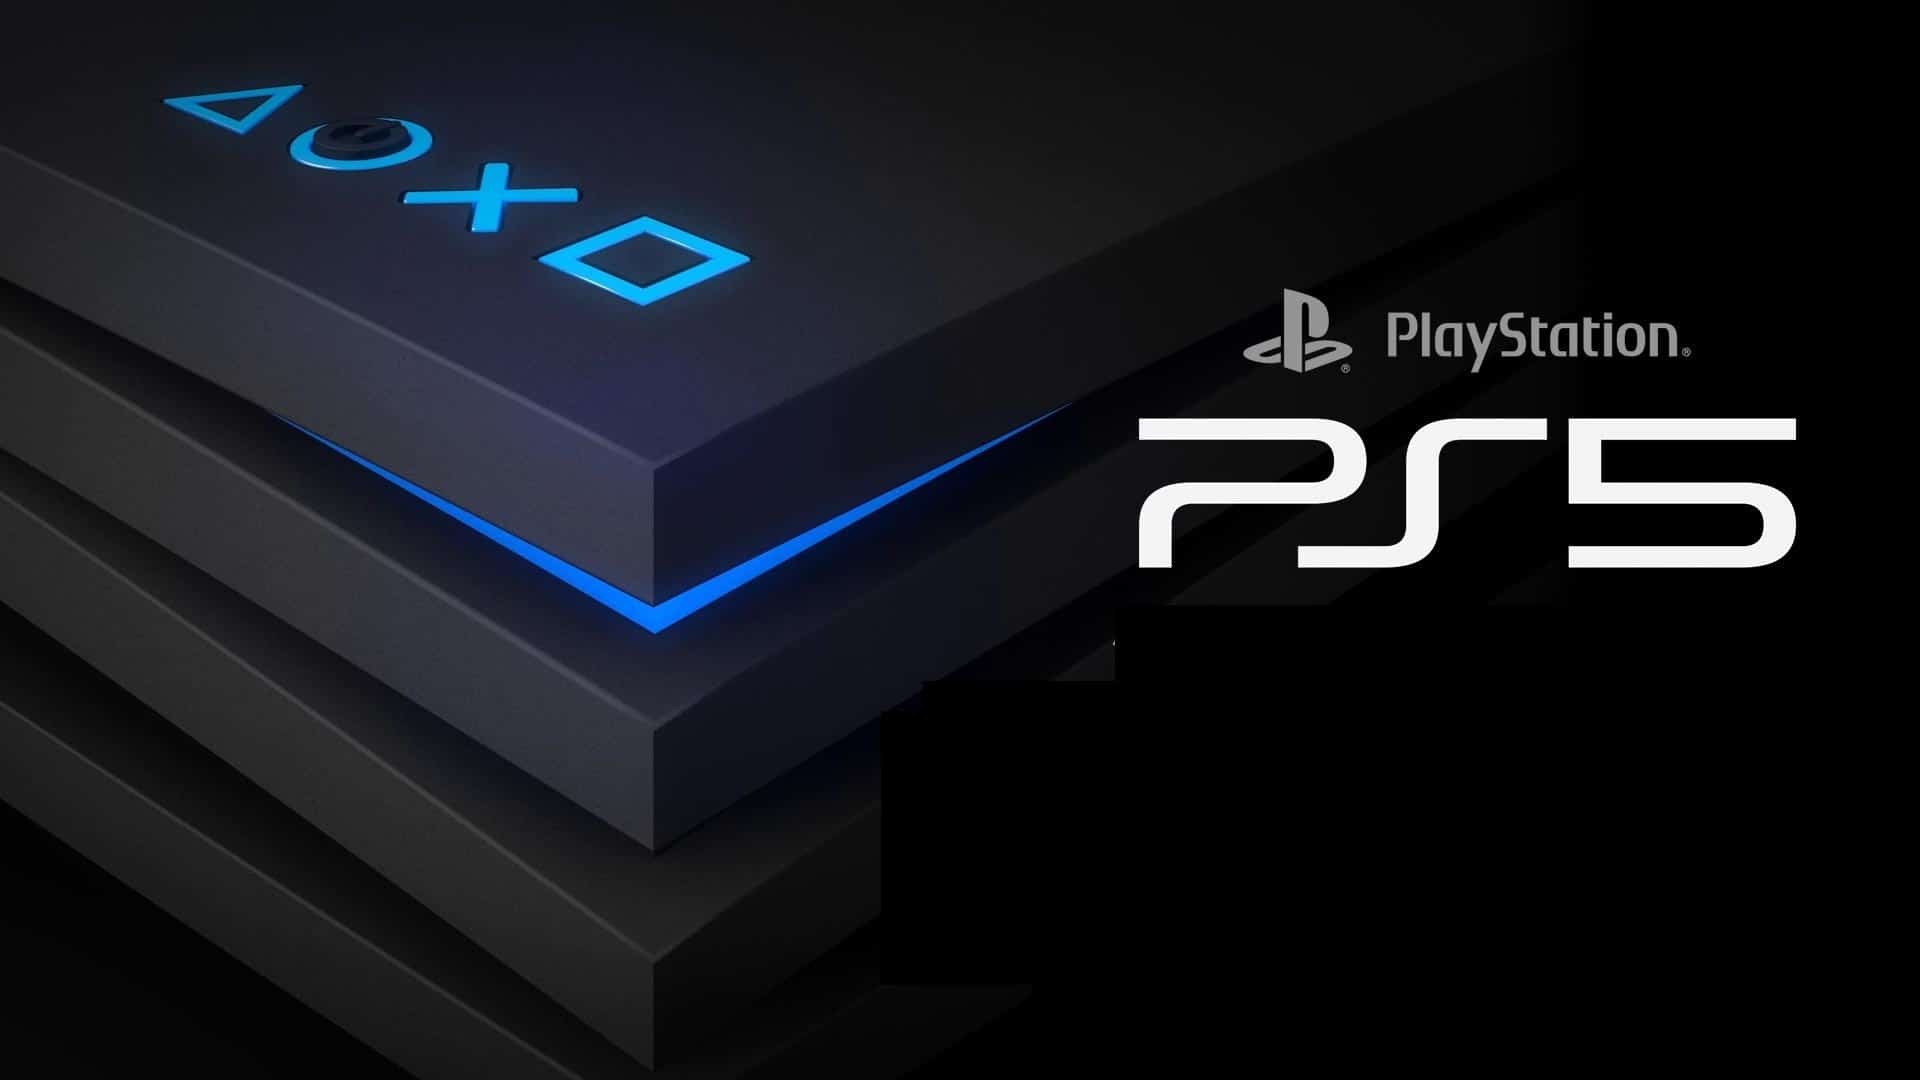 Vaza nova imagem do Dev KIT do PlayStation 5 [rumor]